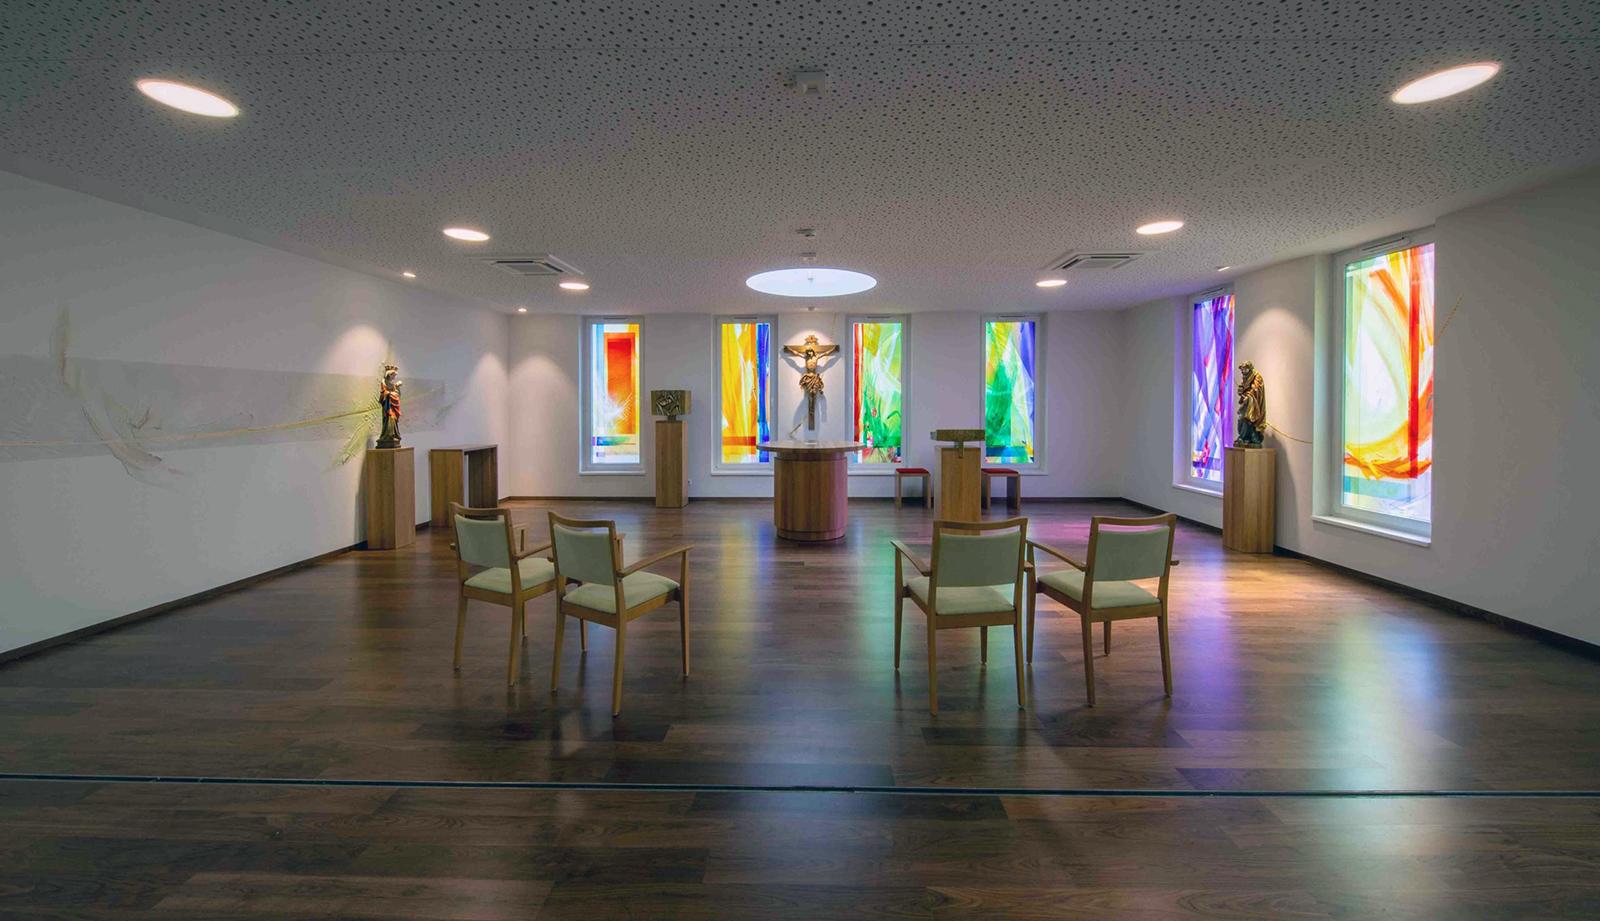 Haus Bethanien Komplettgestaltung Kapelle